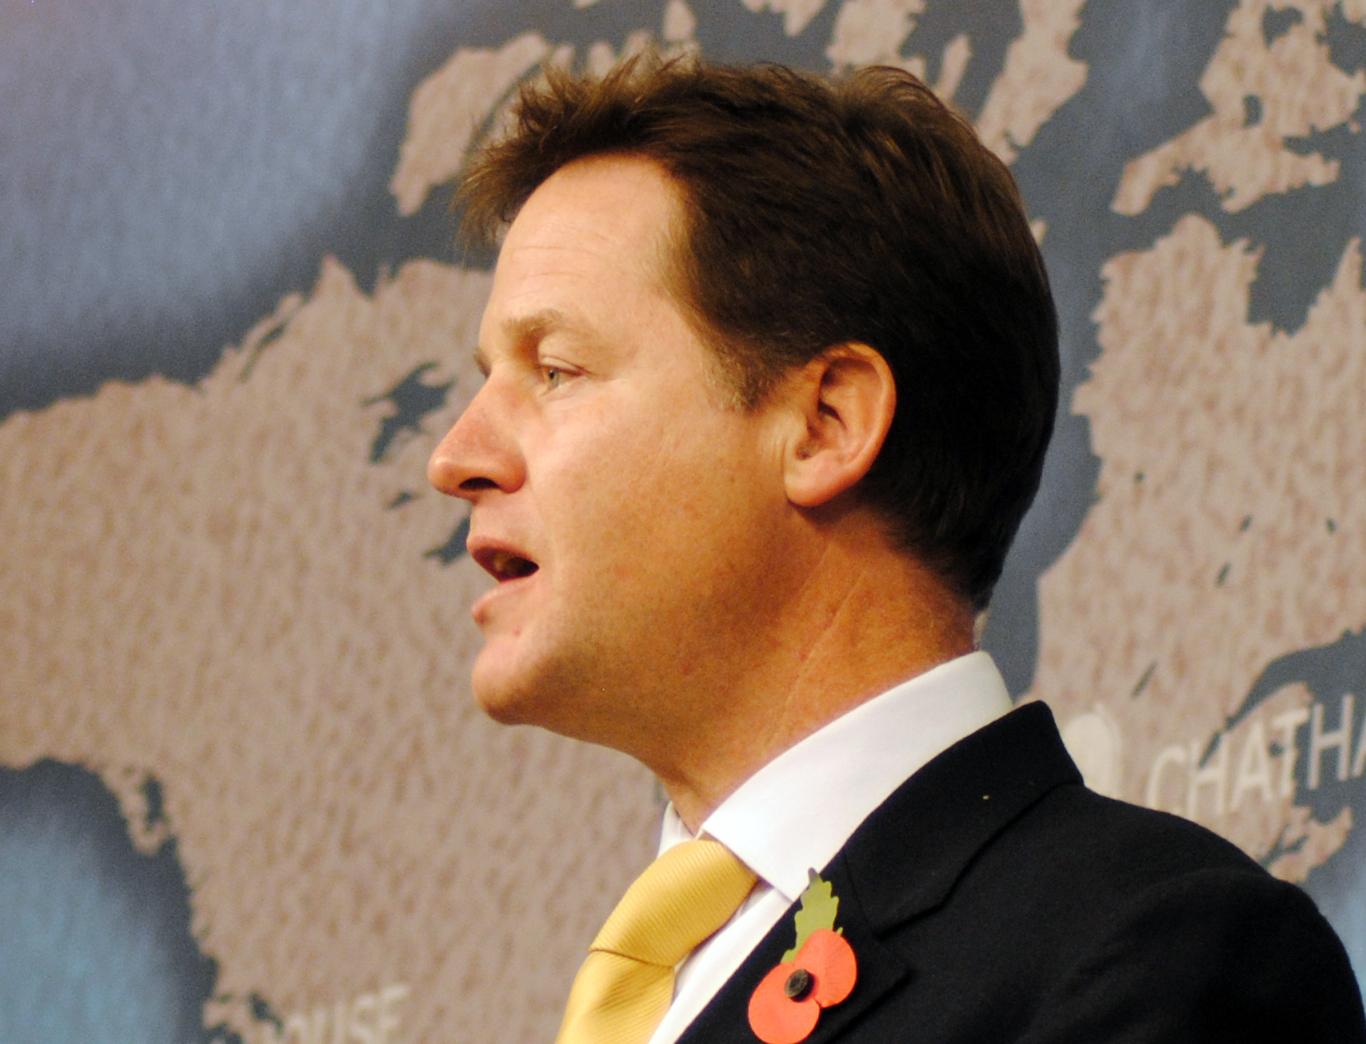 Nick Clegg photo #95200, Nick Clegg image